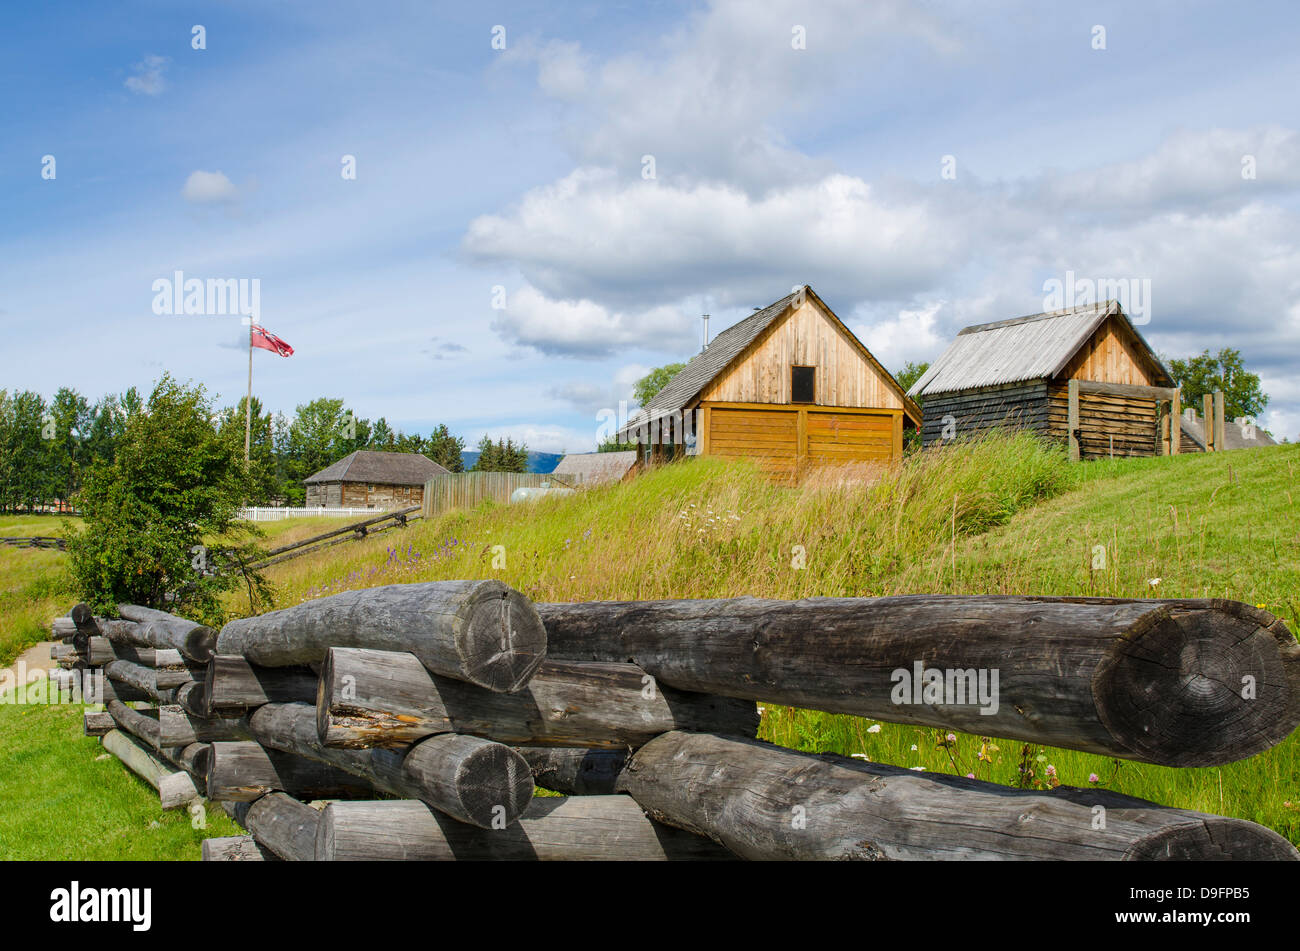 Fort Saint James National Historic Site, British Columbia, Canada - Stock Image